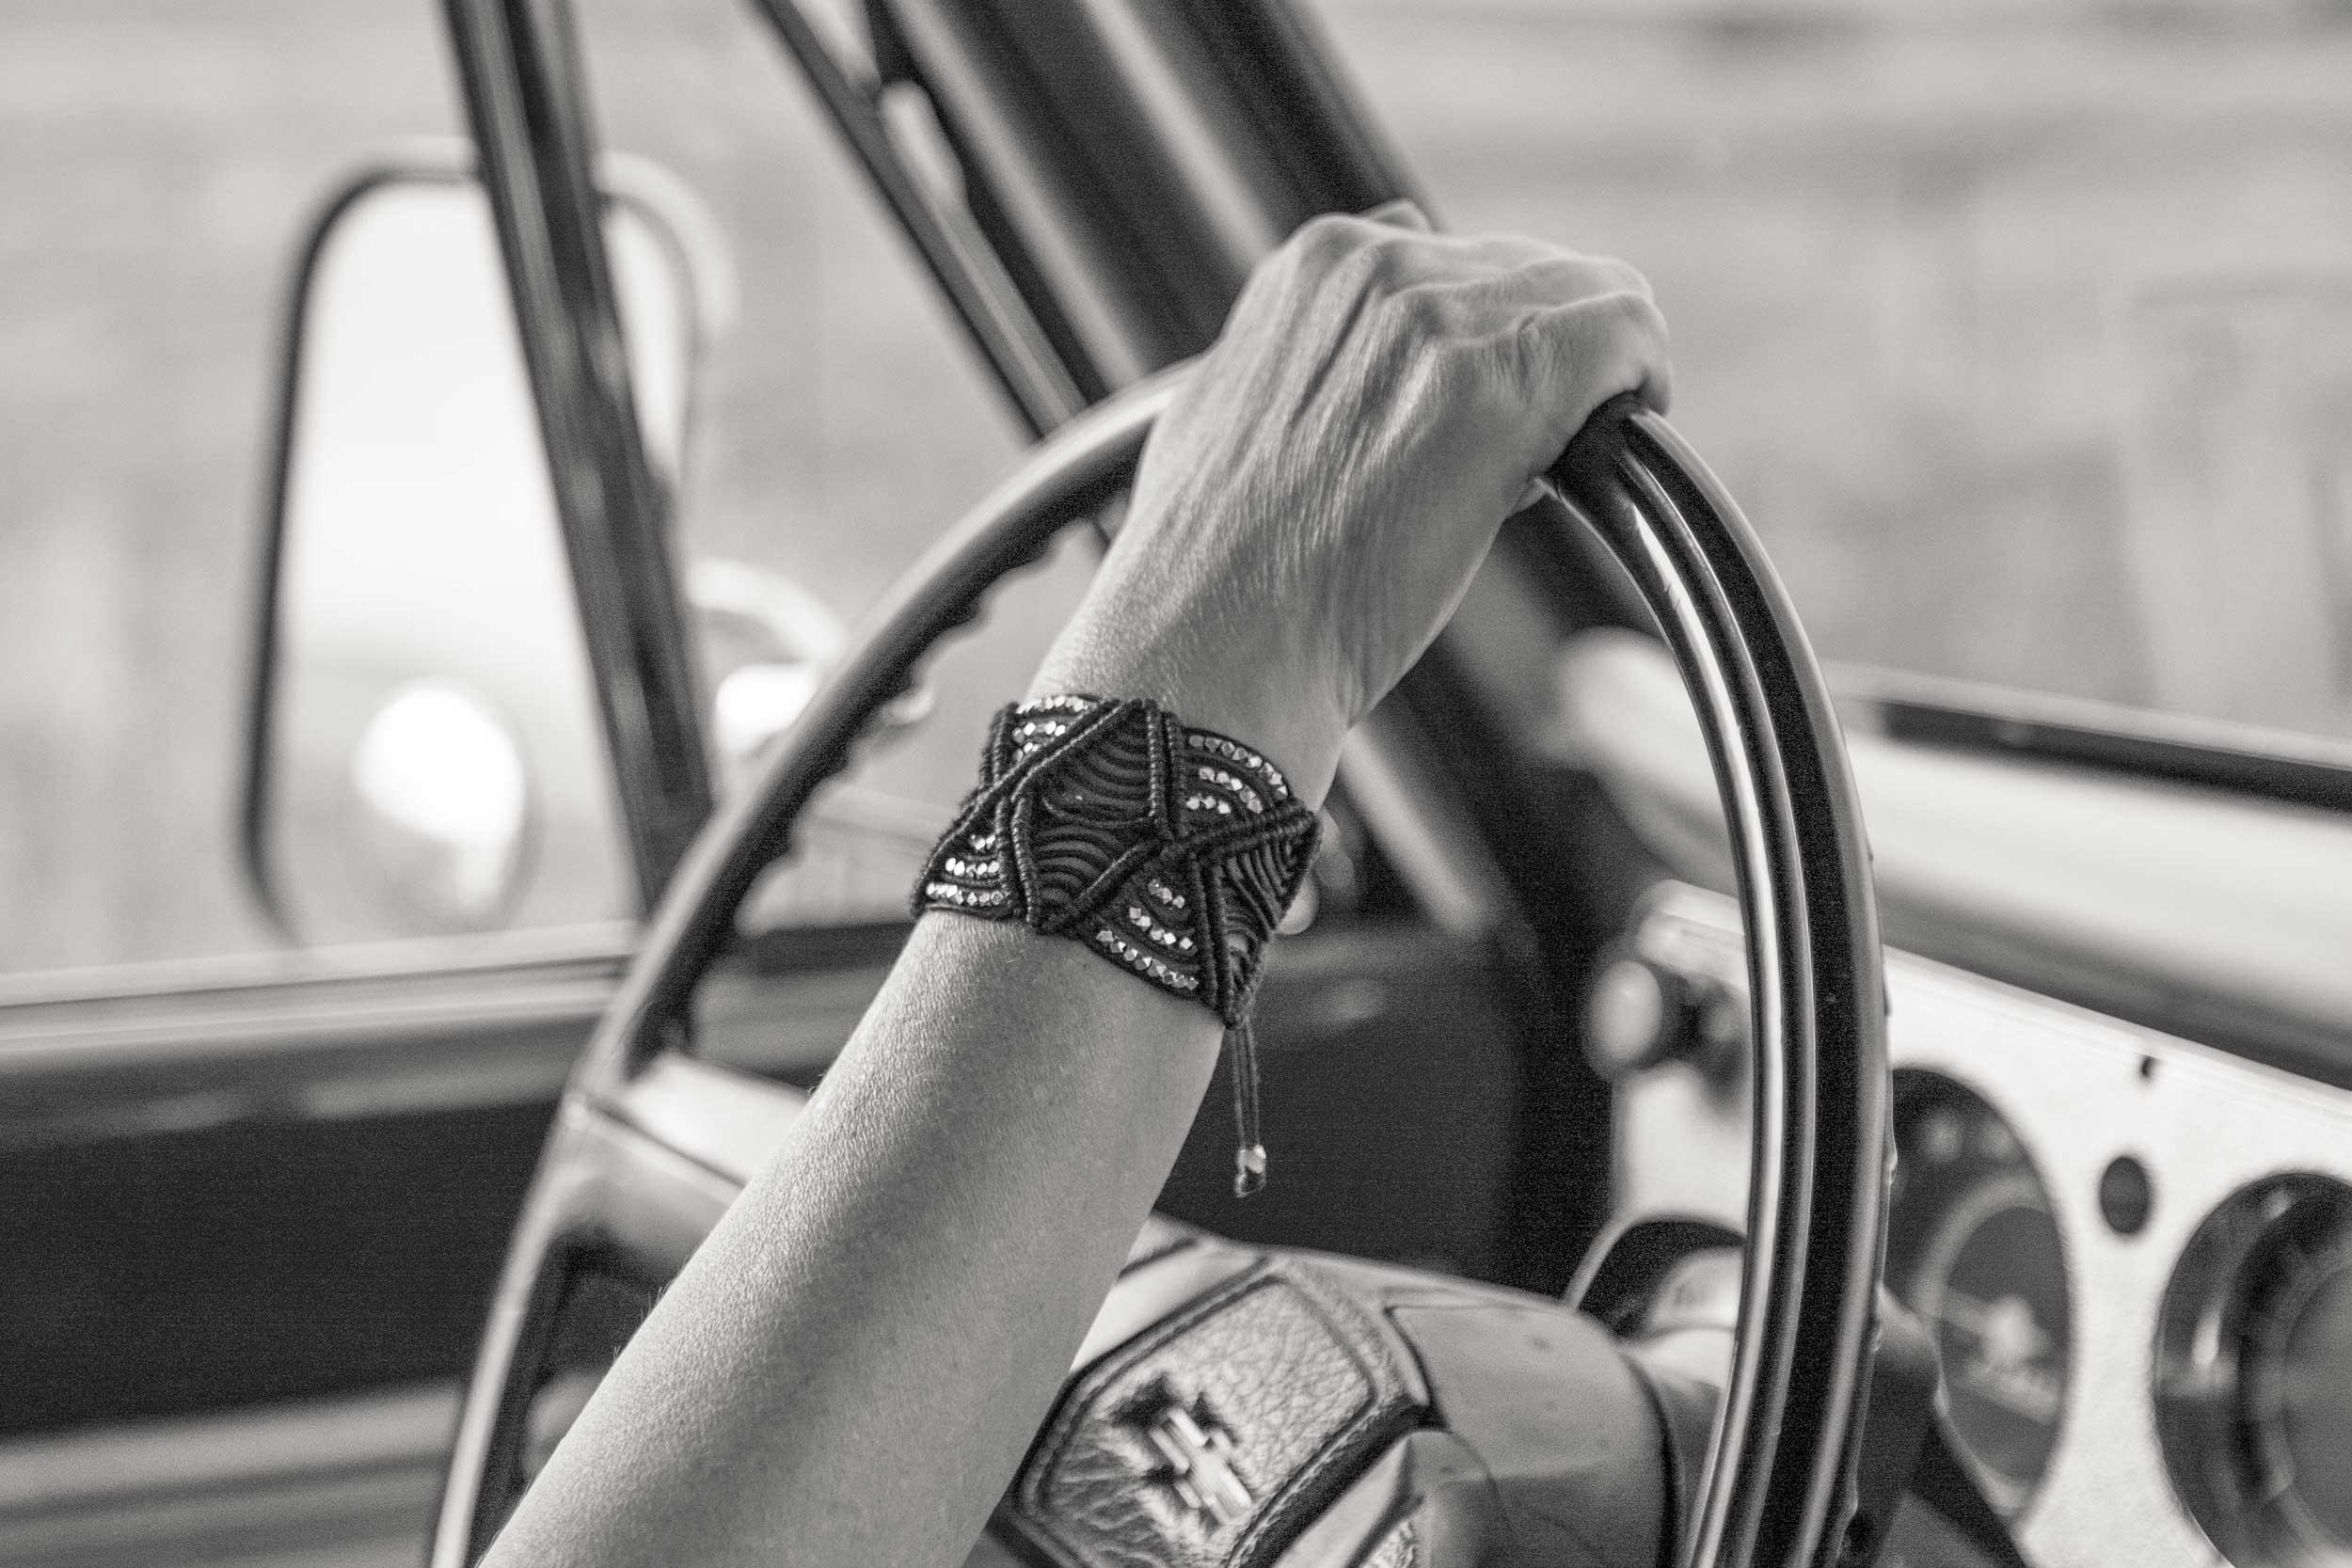 Sheryl Ott wearing a macrame cuff made by Kelli Ronci of Corda Design.